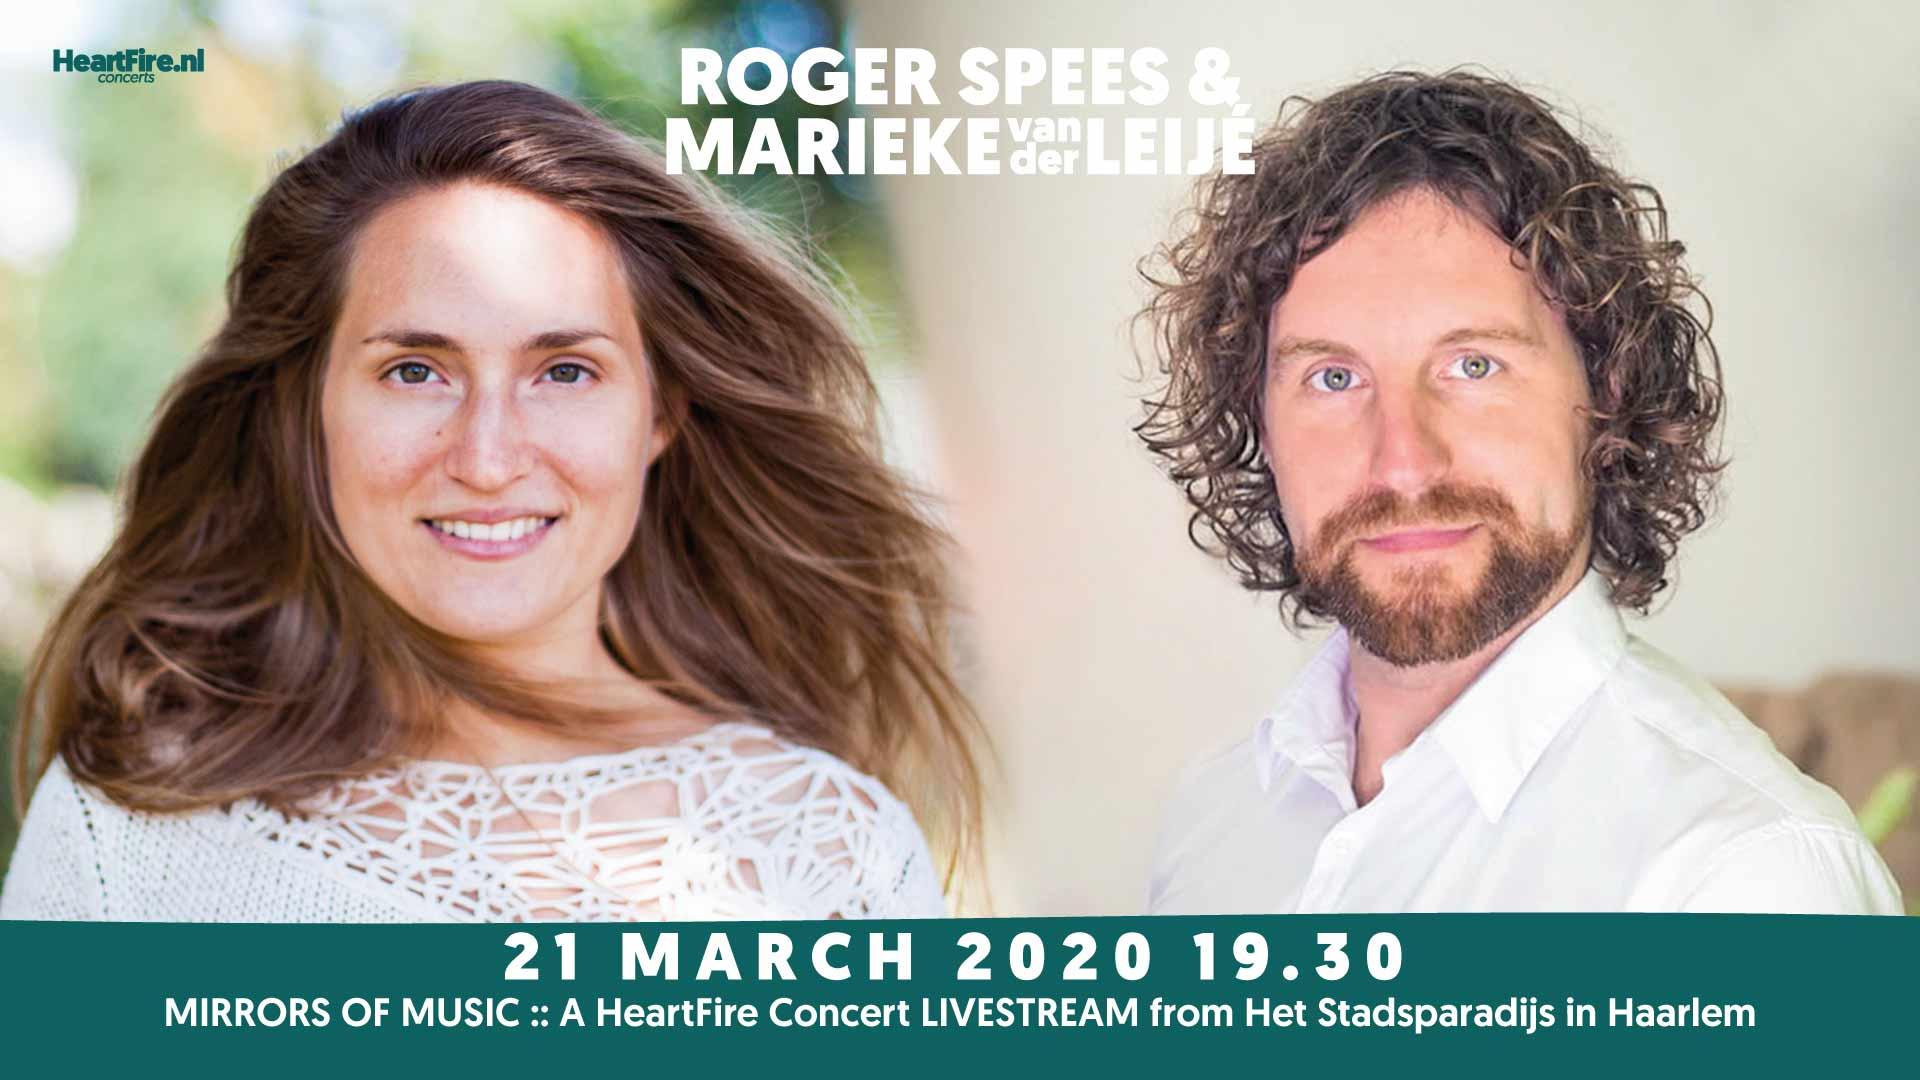 Roger Spees Marieke van der Leije HeartFire.nl Mirrors of Music Stadsparadijs Haarlem 21 maart 2020 Livestream Concert